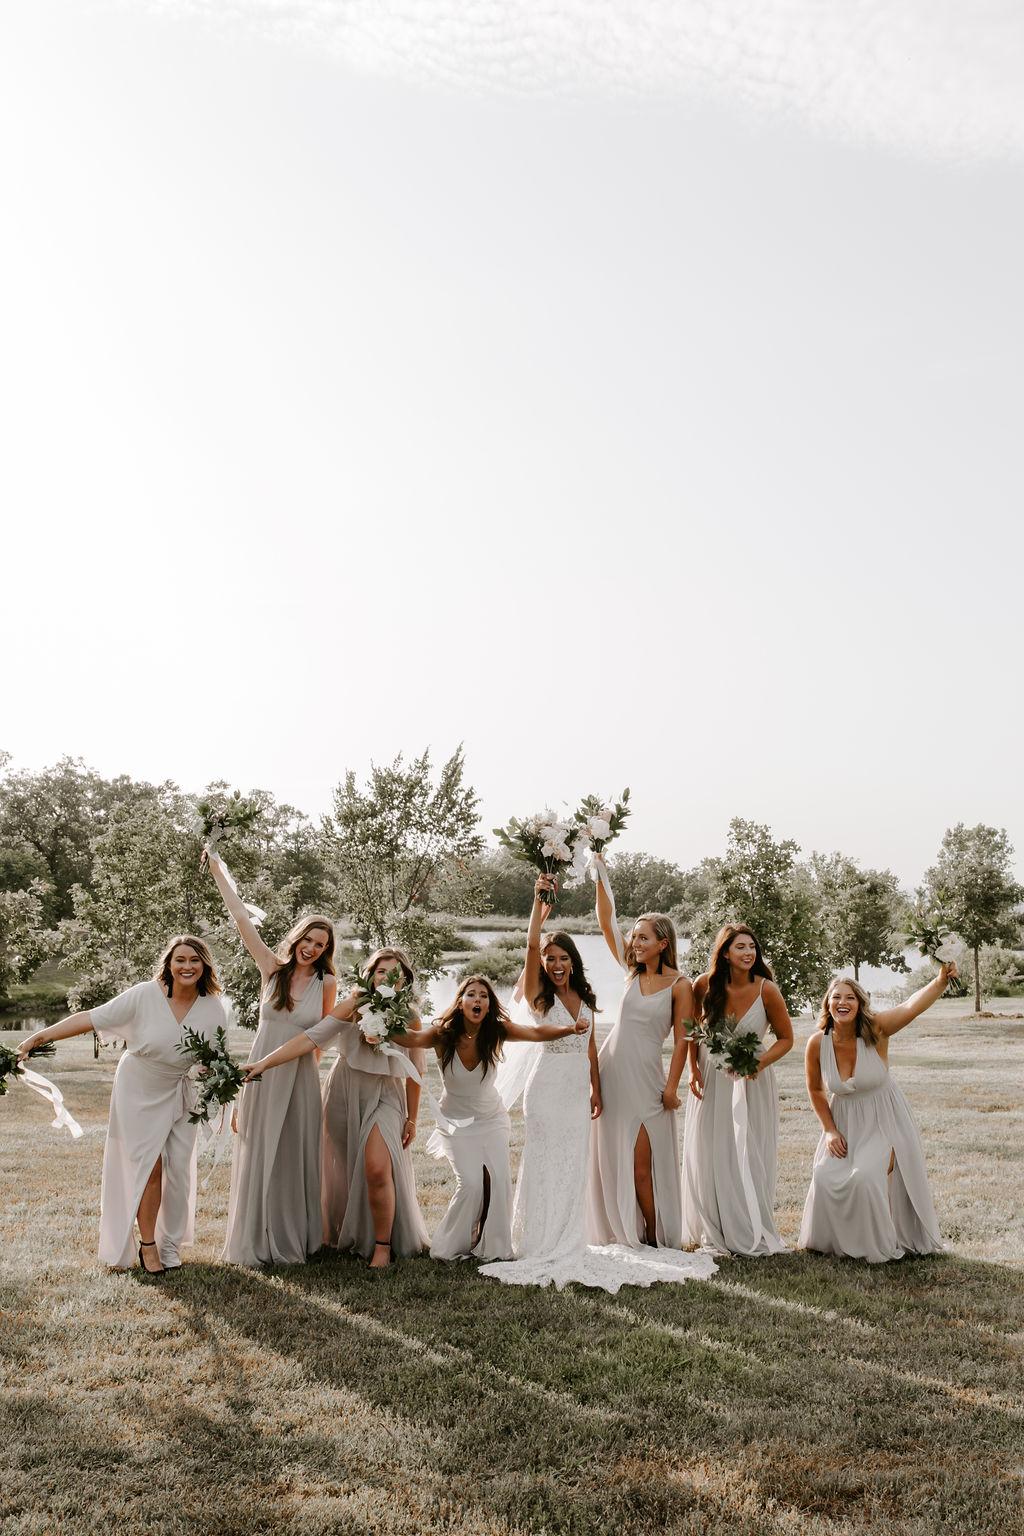 Tulsa White Barn Wedding Venue Outdoor Ceremony 92.jpg